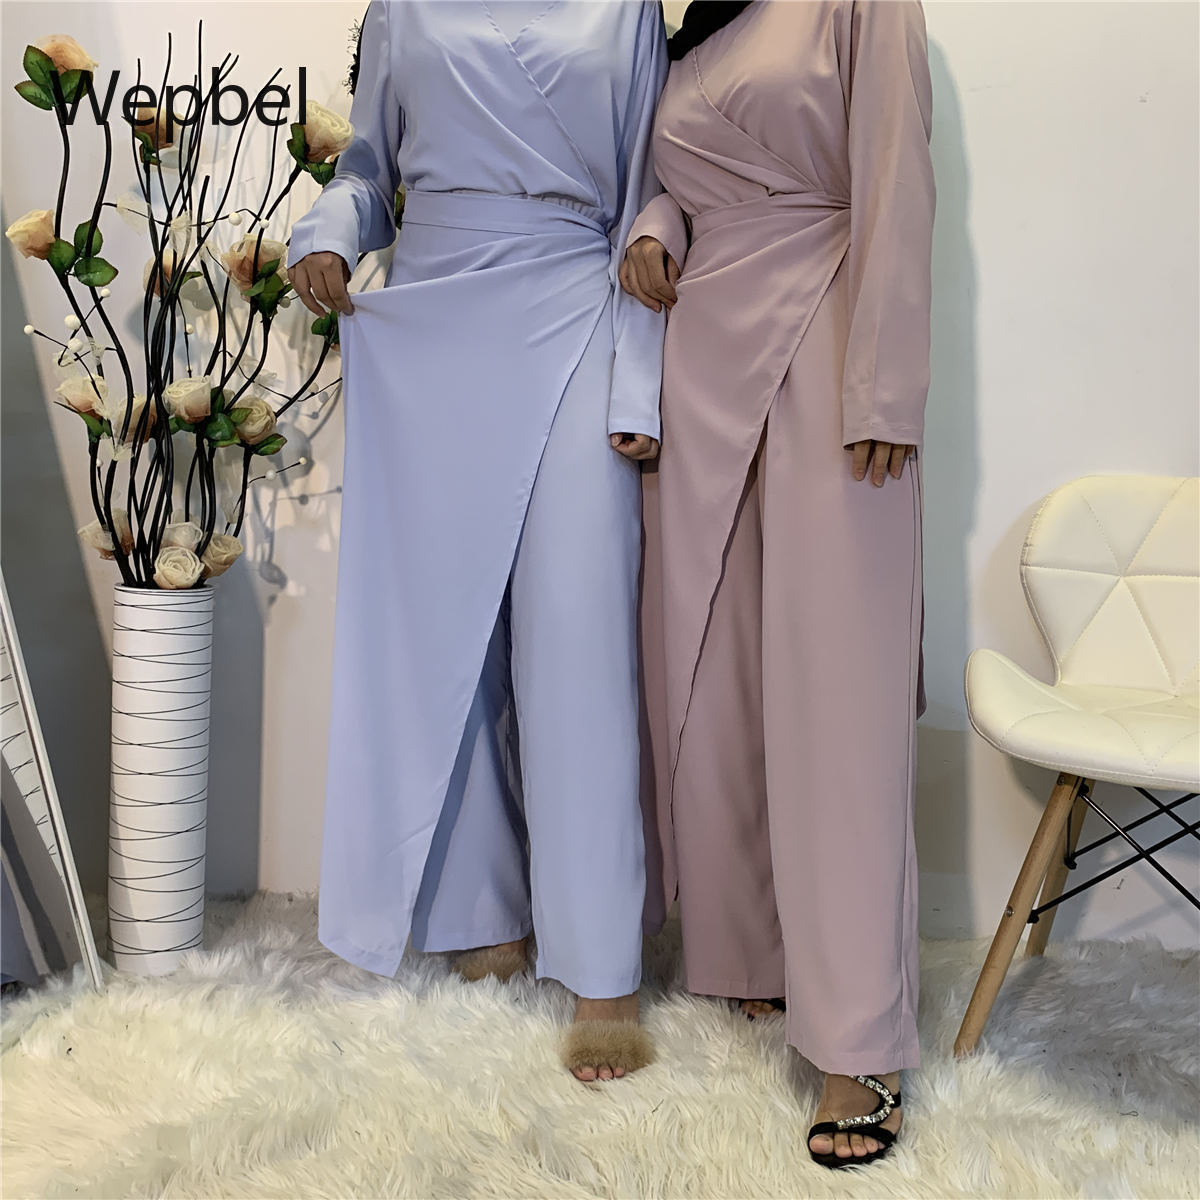 WEPBEL أطقم نسائية إسلامية بفتحة رقبة على شكل حرف v وبلوزات طويلة وسراويل عالية الخصر مجموعات عربية دبي عدد 2 قطعة ملابس بدلة مسلمة